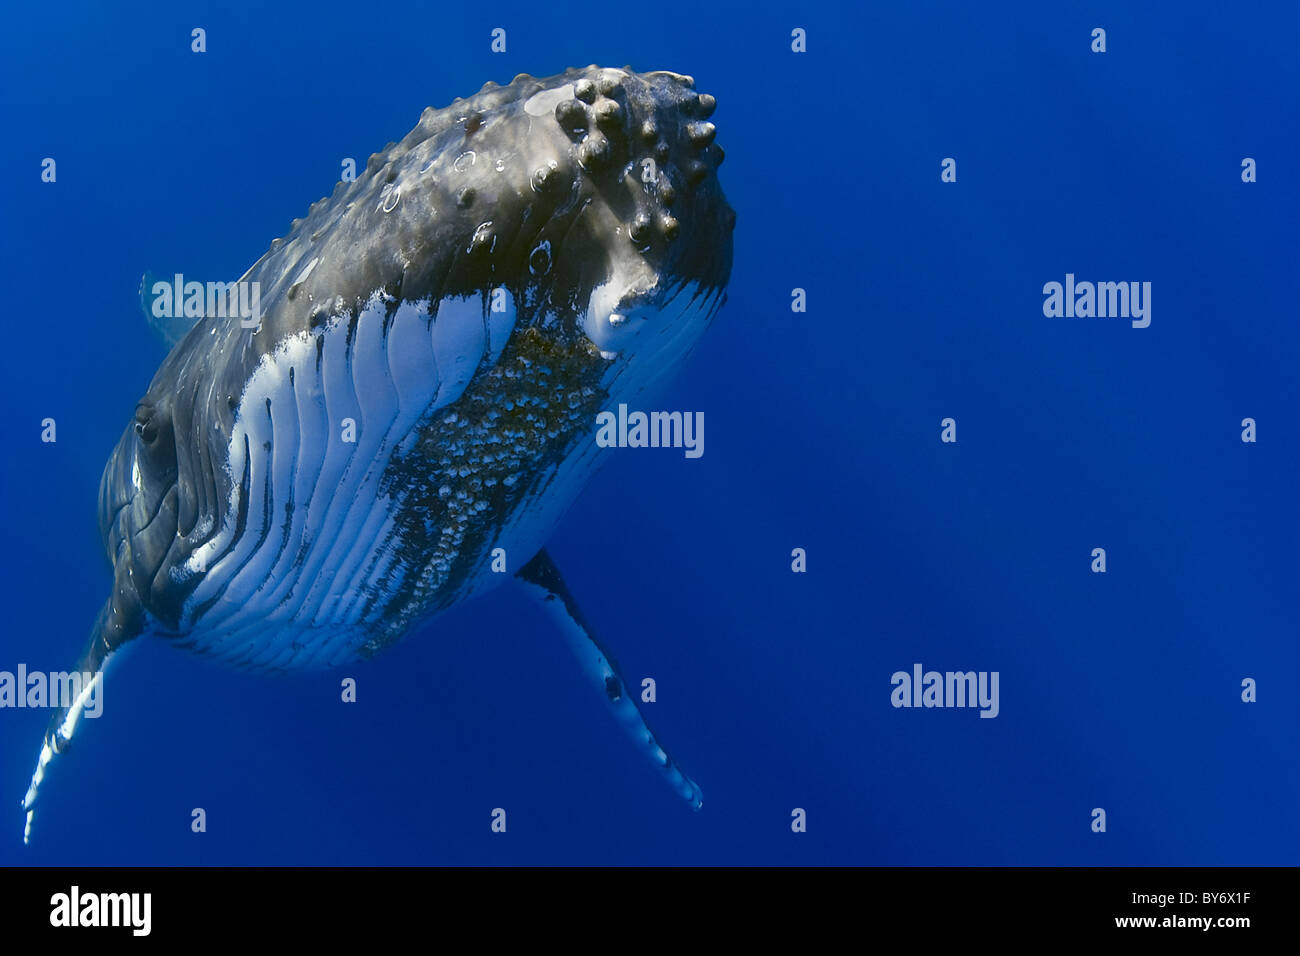 La ballena jorobada, Megaptera novaeangliae, Hawaii, USA, Océano Pacífico Foto de stock